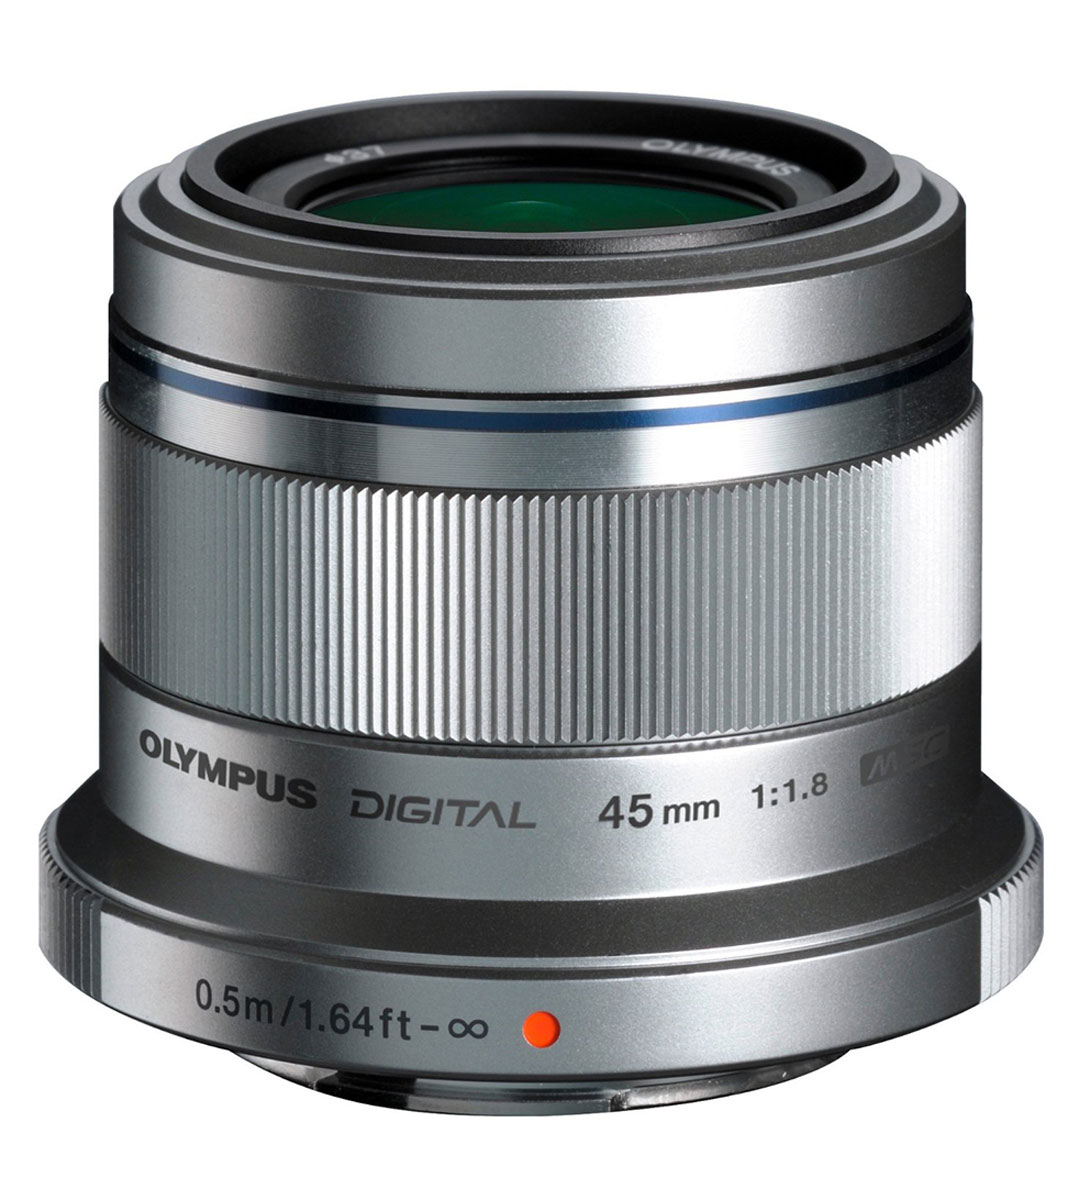 Olympus M.Zuiko Digital 45mm f/1.8, Silver объектив